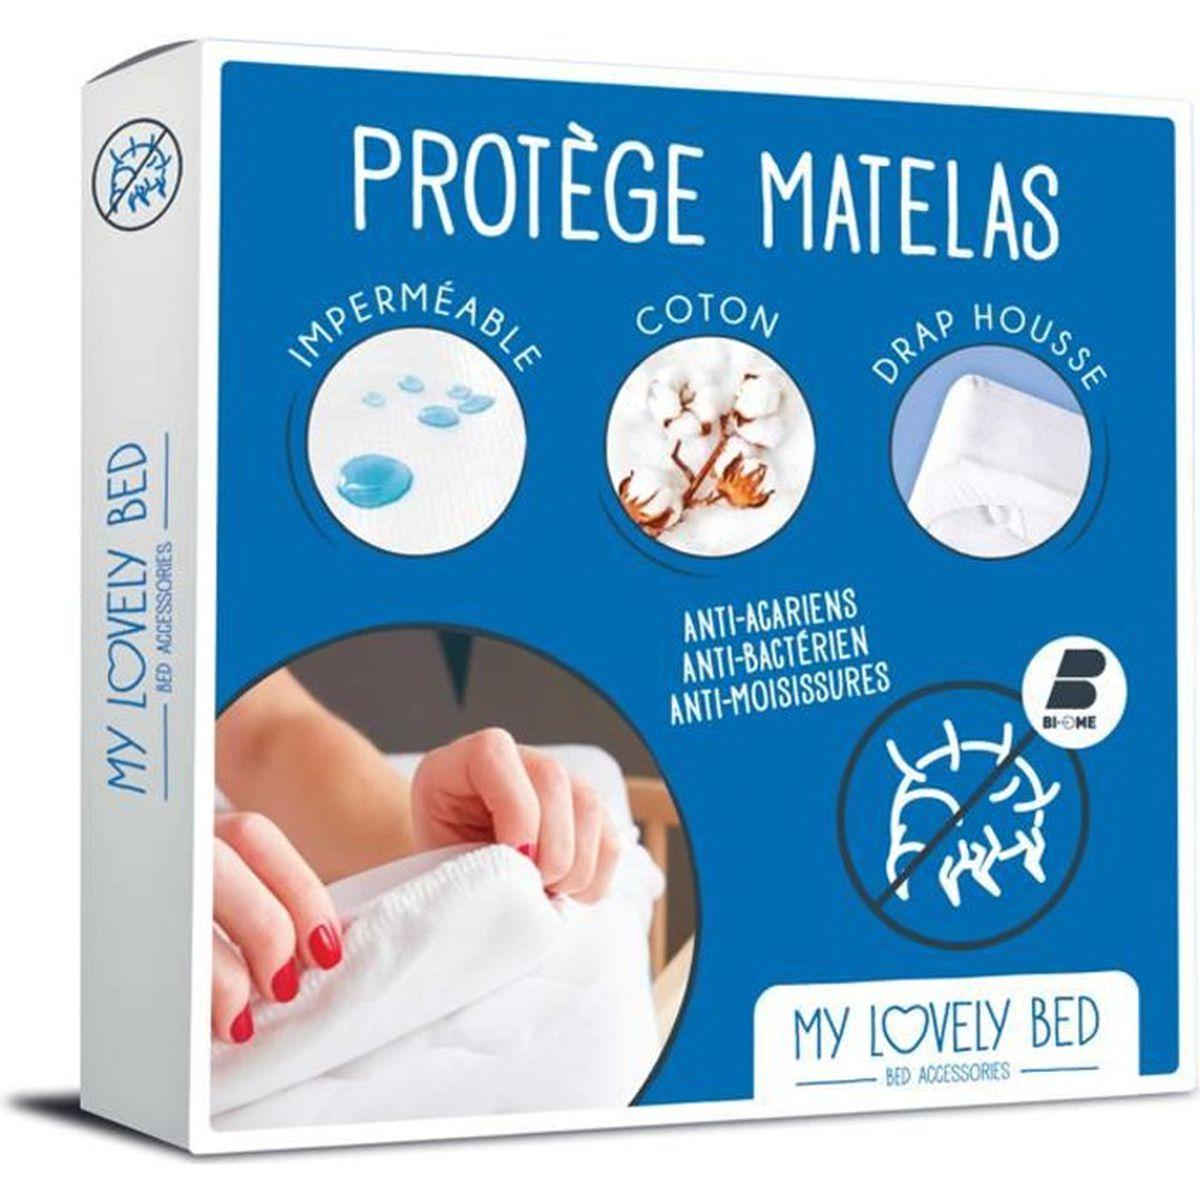 PROTÈGE MATELAS  My Lovely Bed - Protège matelas - Lit articulé : 1